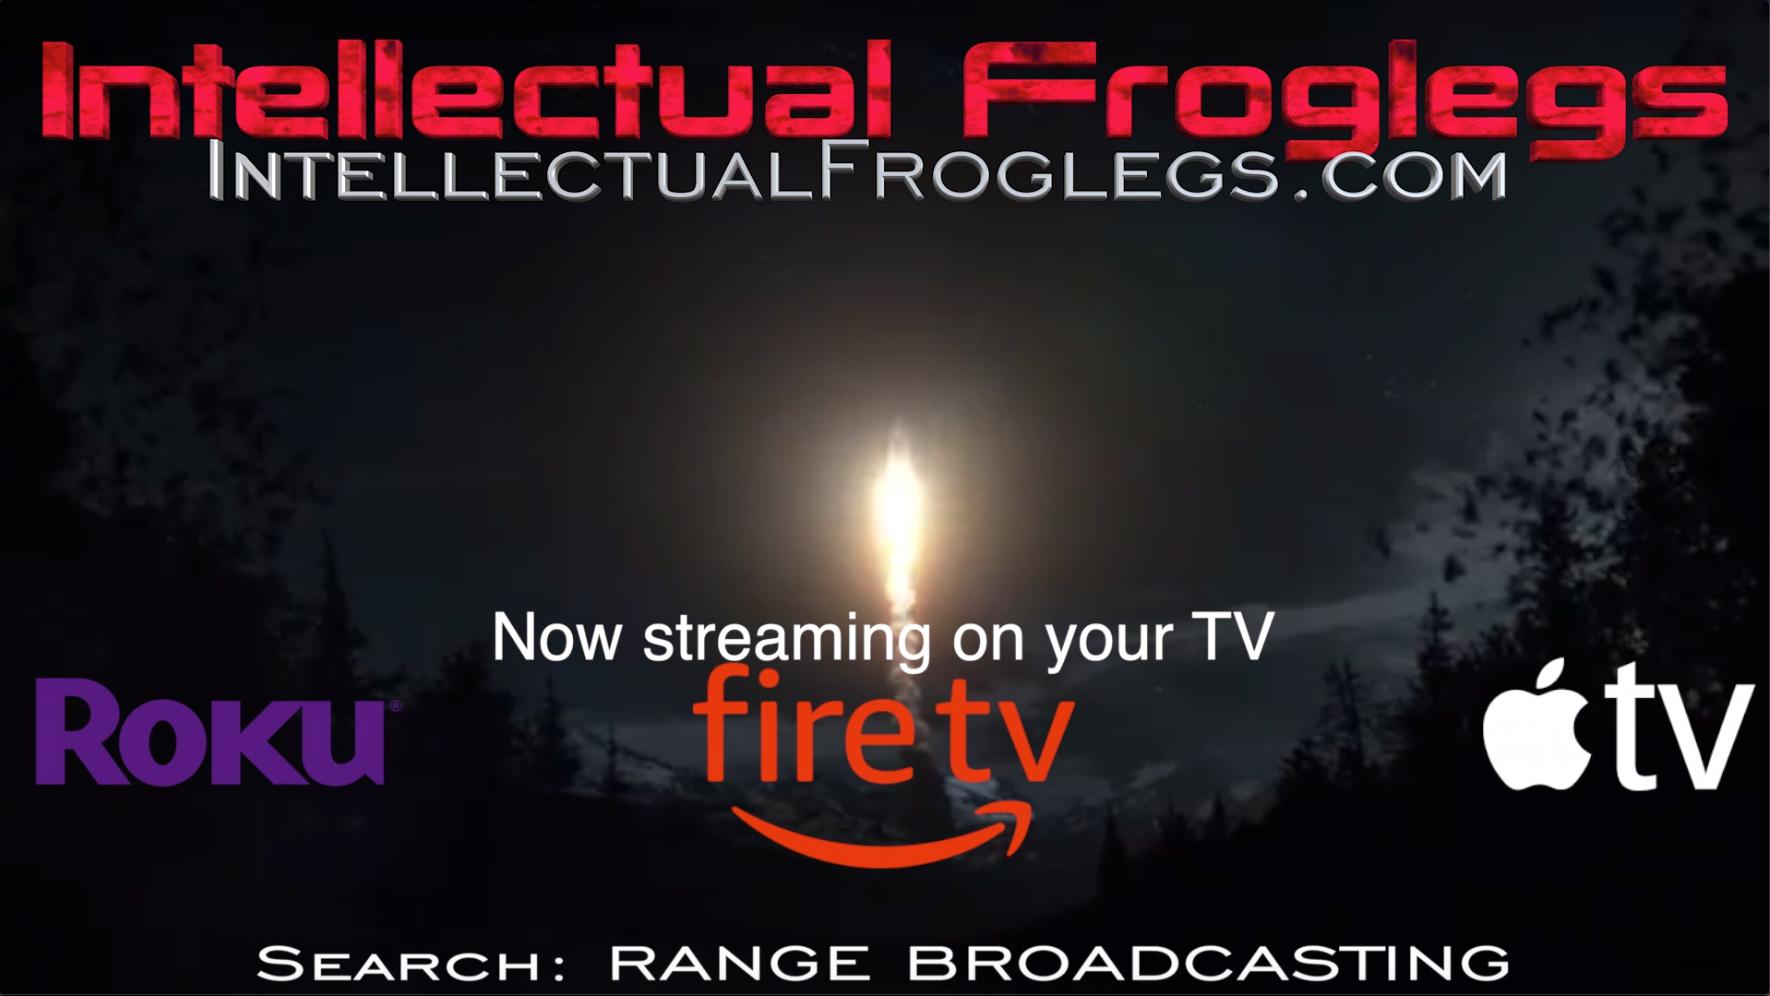 FUNNY Promo: Intellectual Froglegs -> PSA: Allergy v Virus